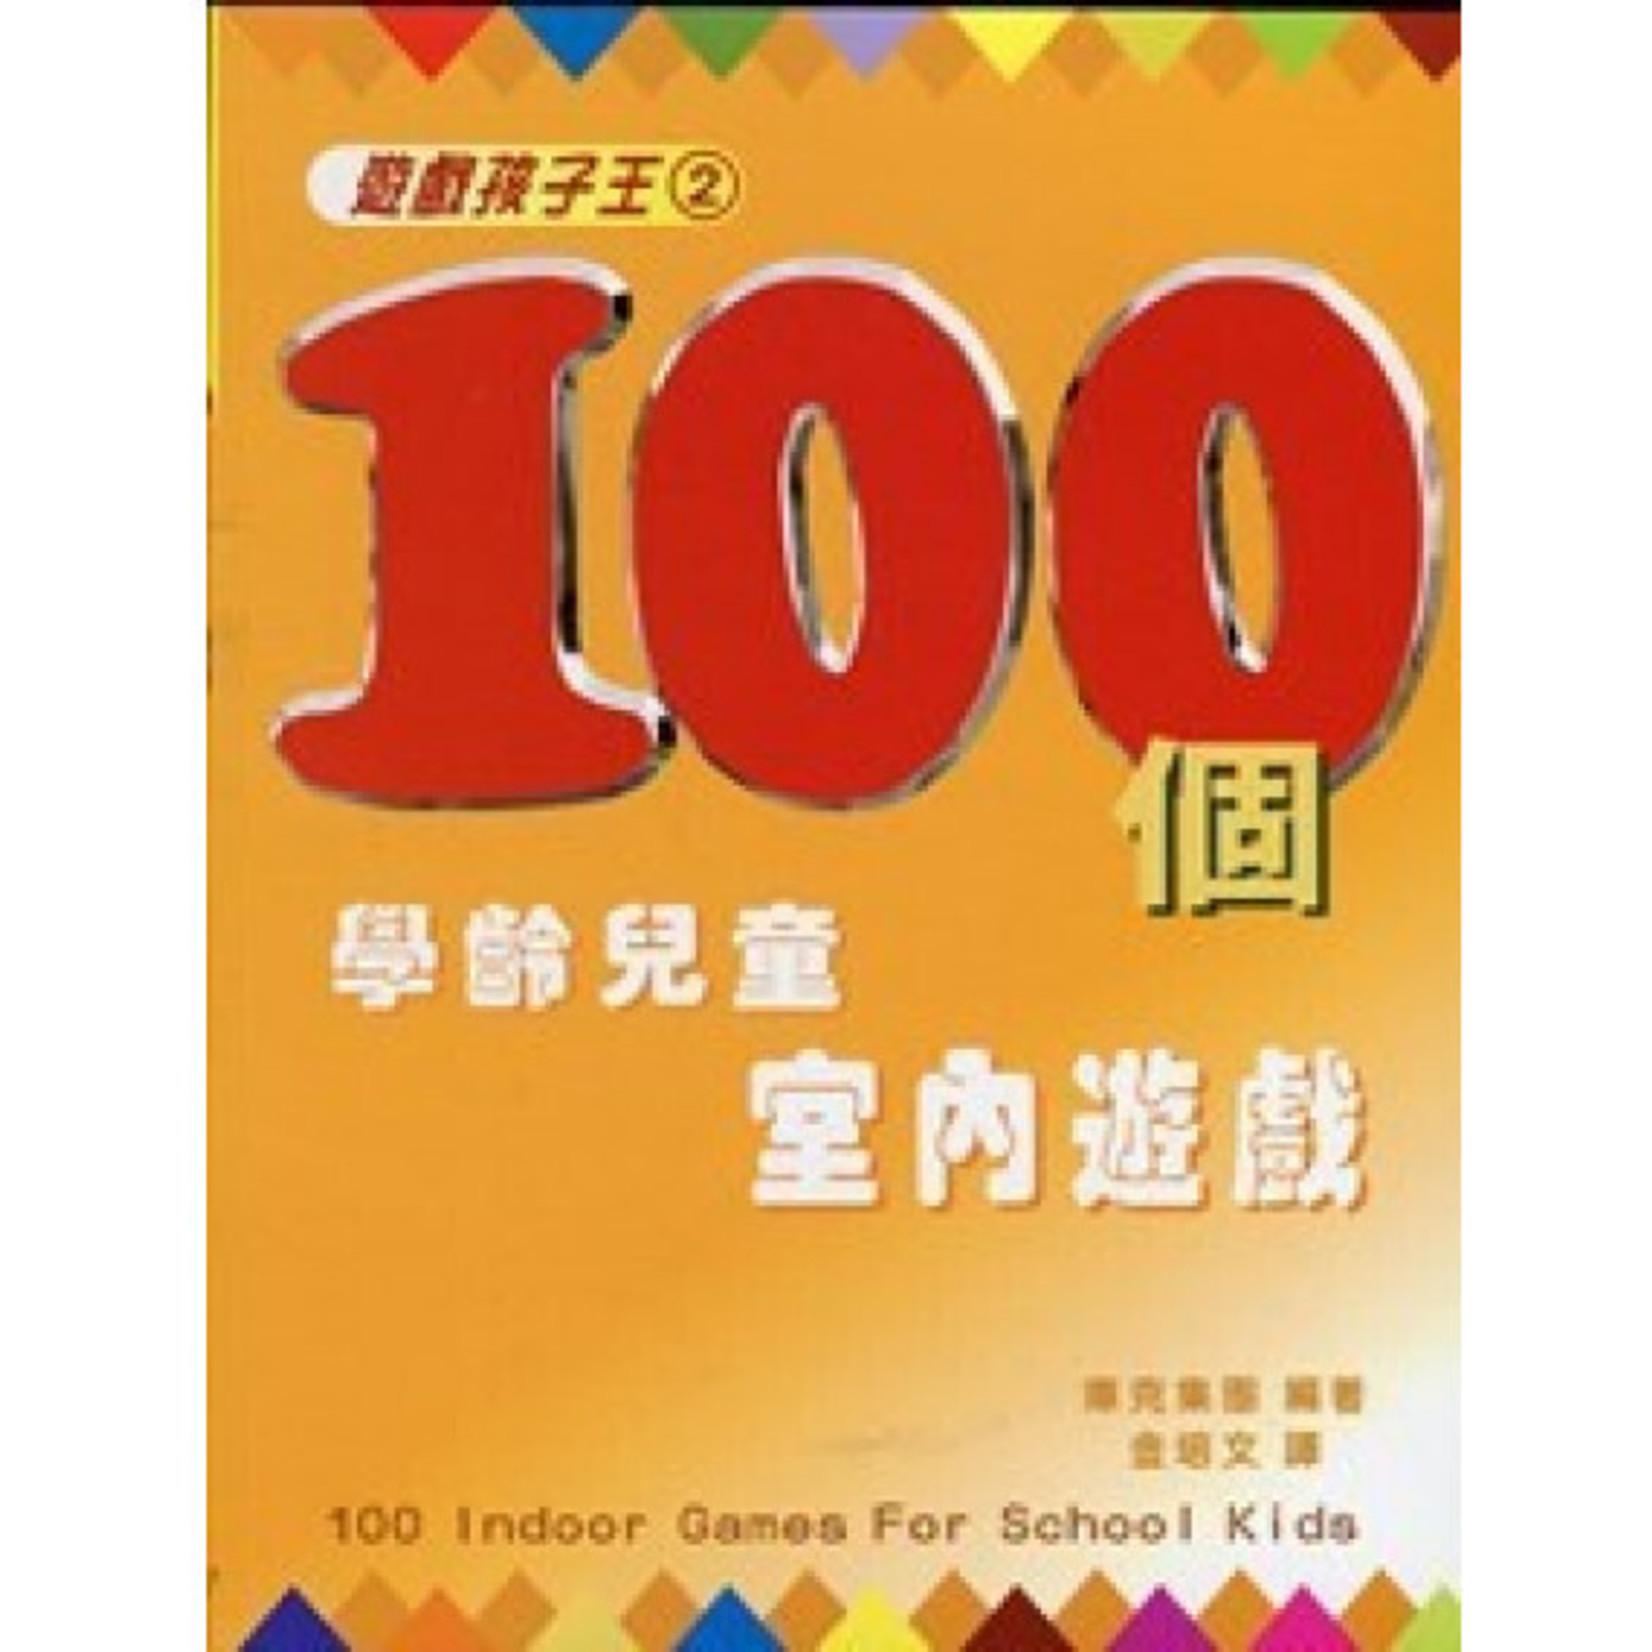 中國主日學協會 China Sunday School Association 遊戲孩子王2:100個學齡兒童室內遊戲 100 Indoor Games for School Kids